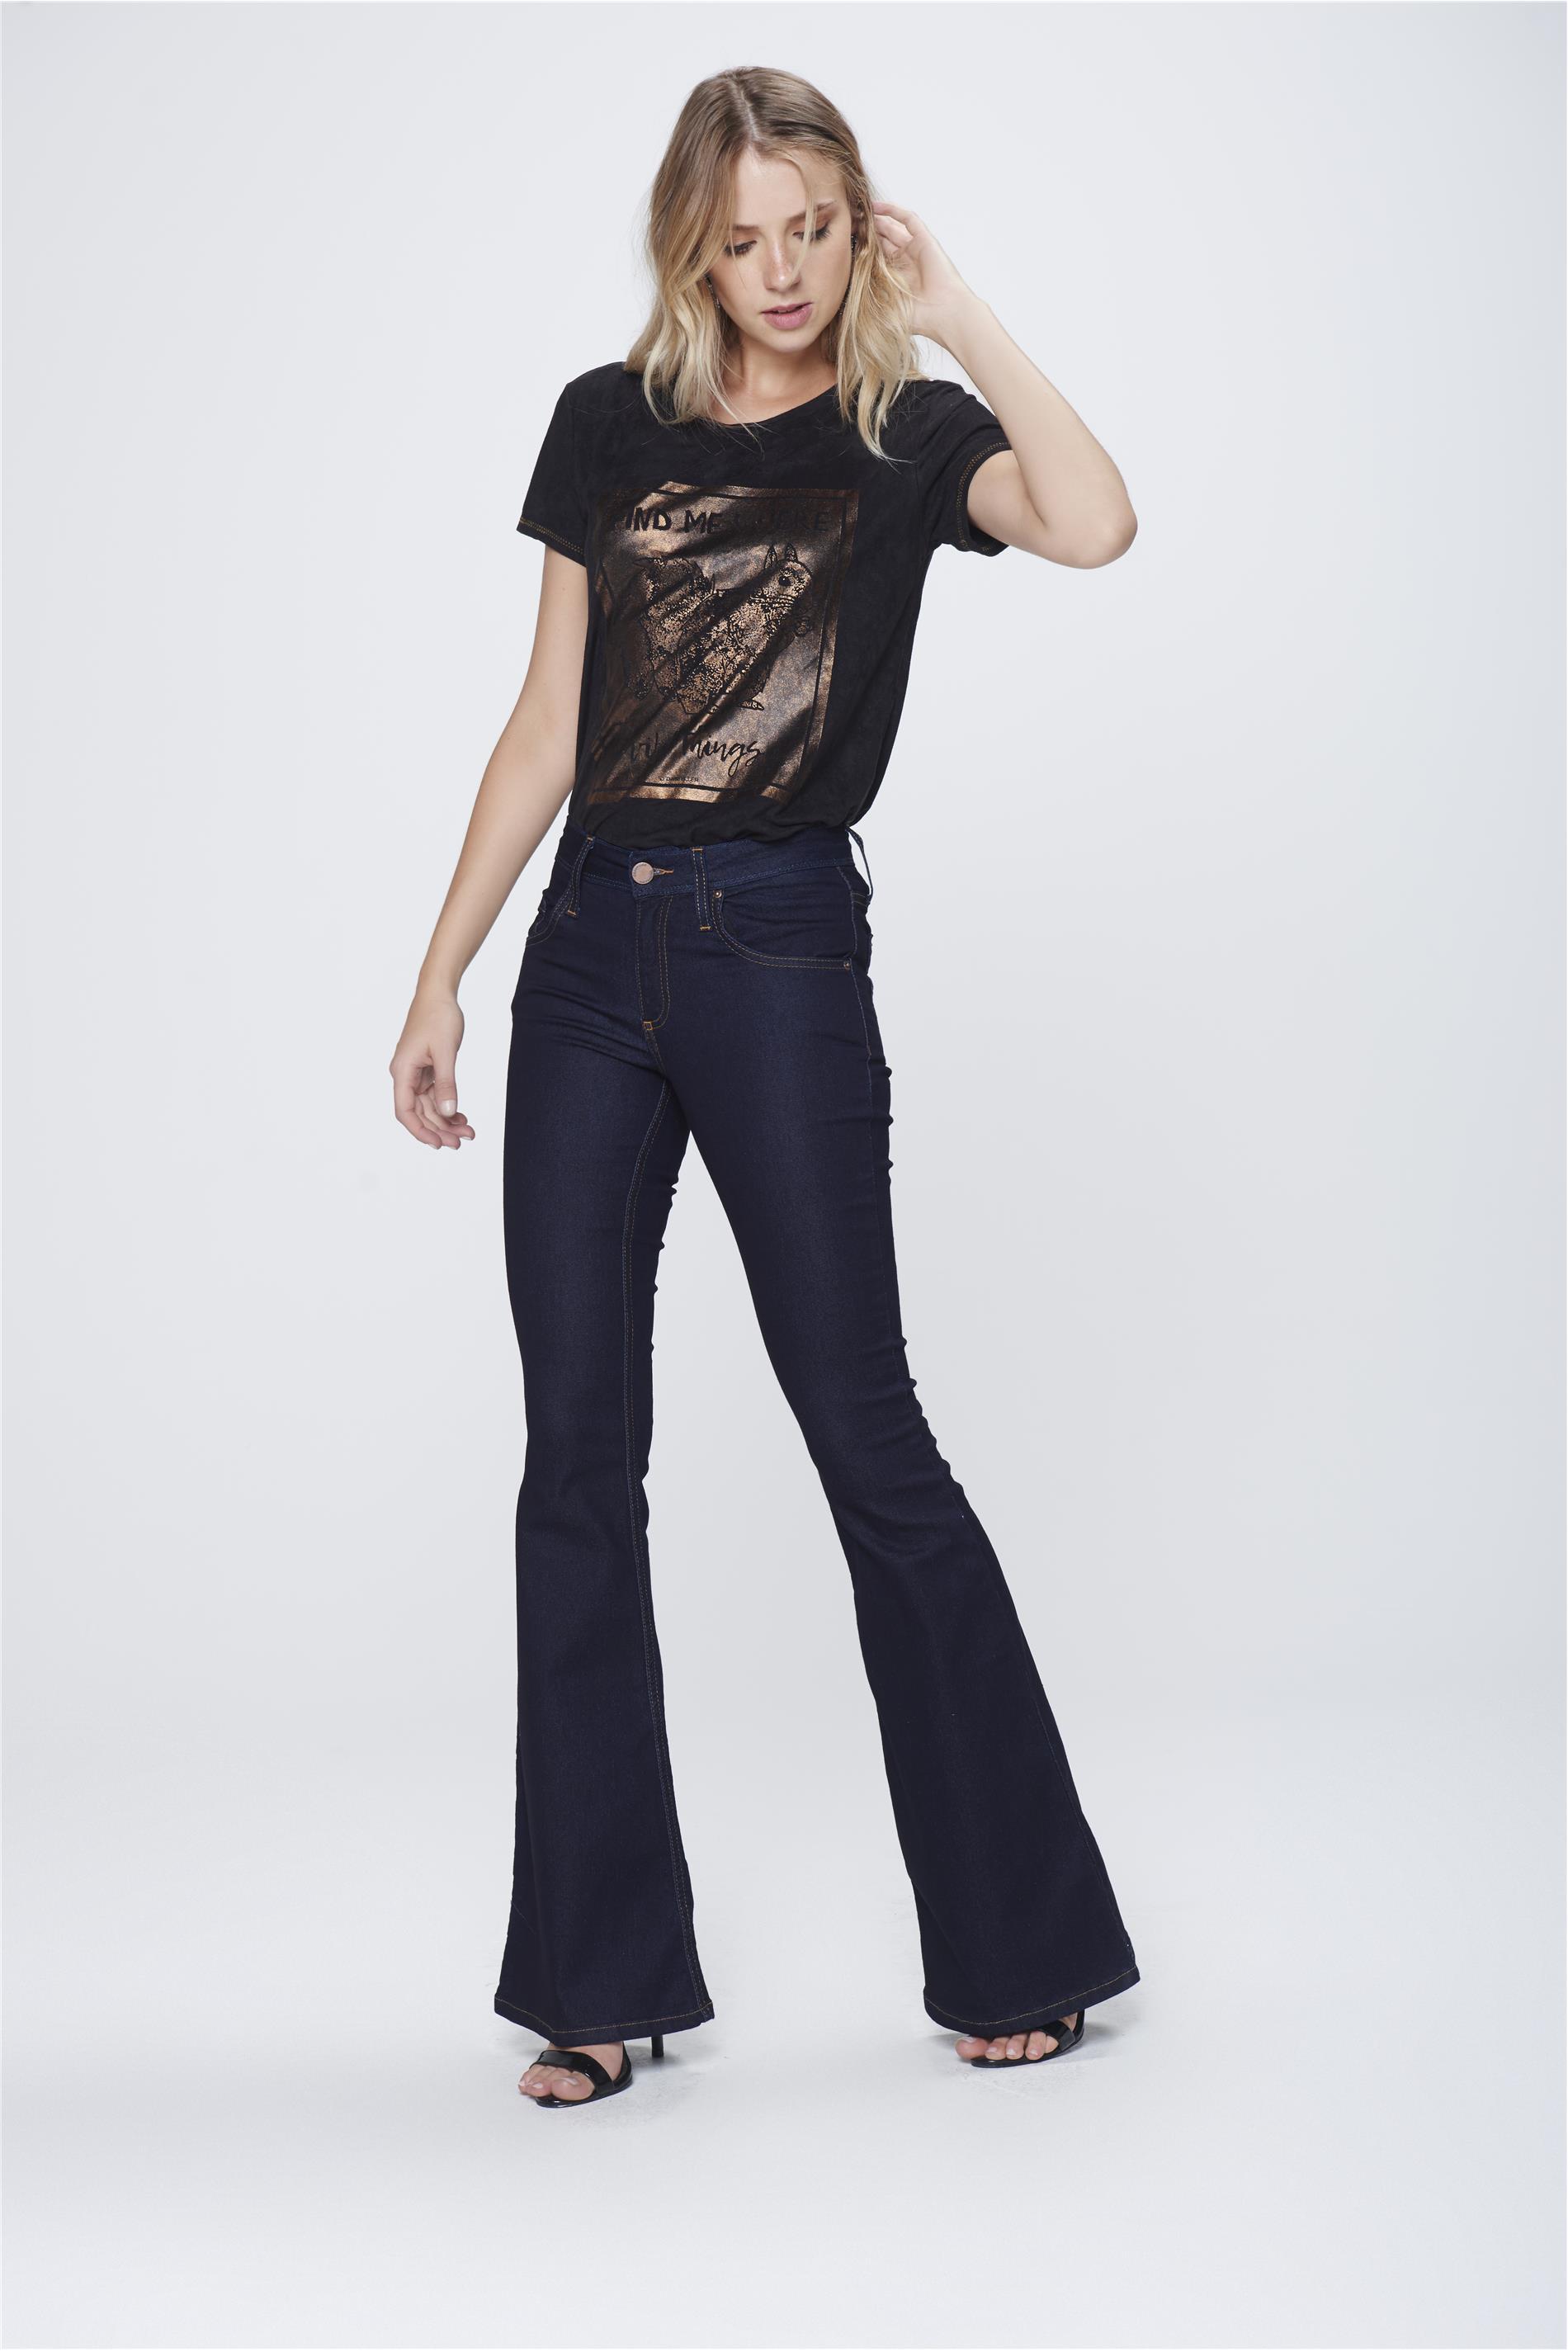 41bfc1536 Calça Flare Jeans Escuro Feminina - Damyller